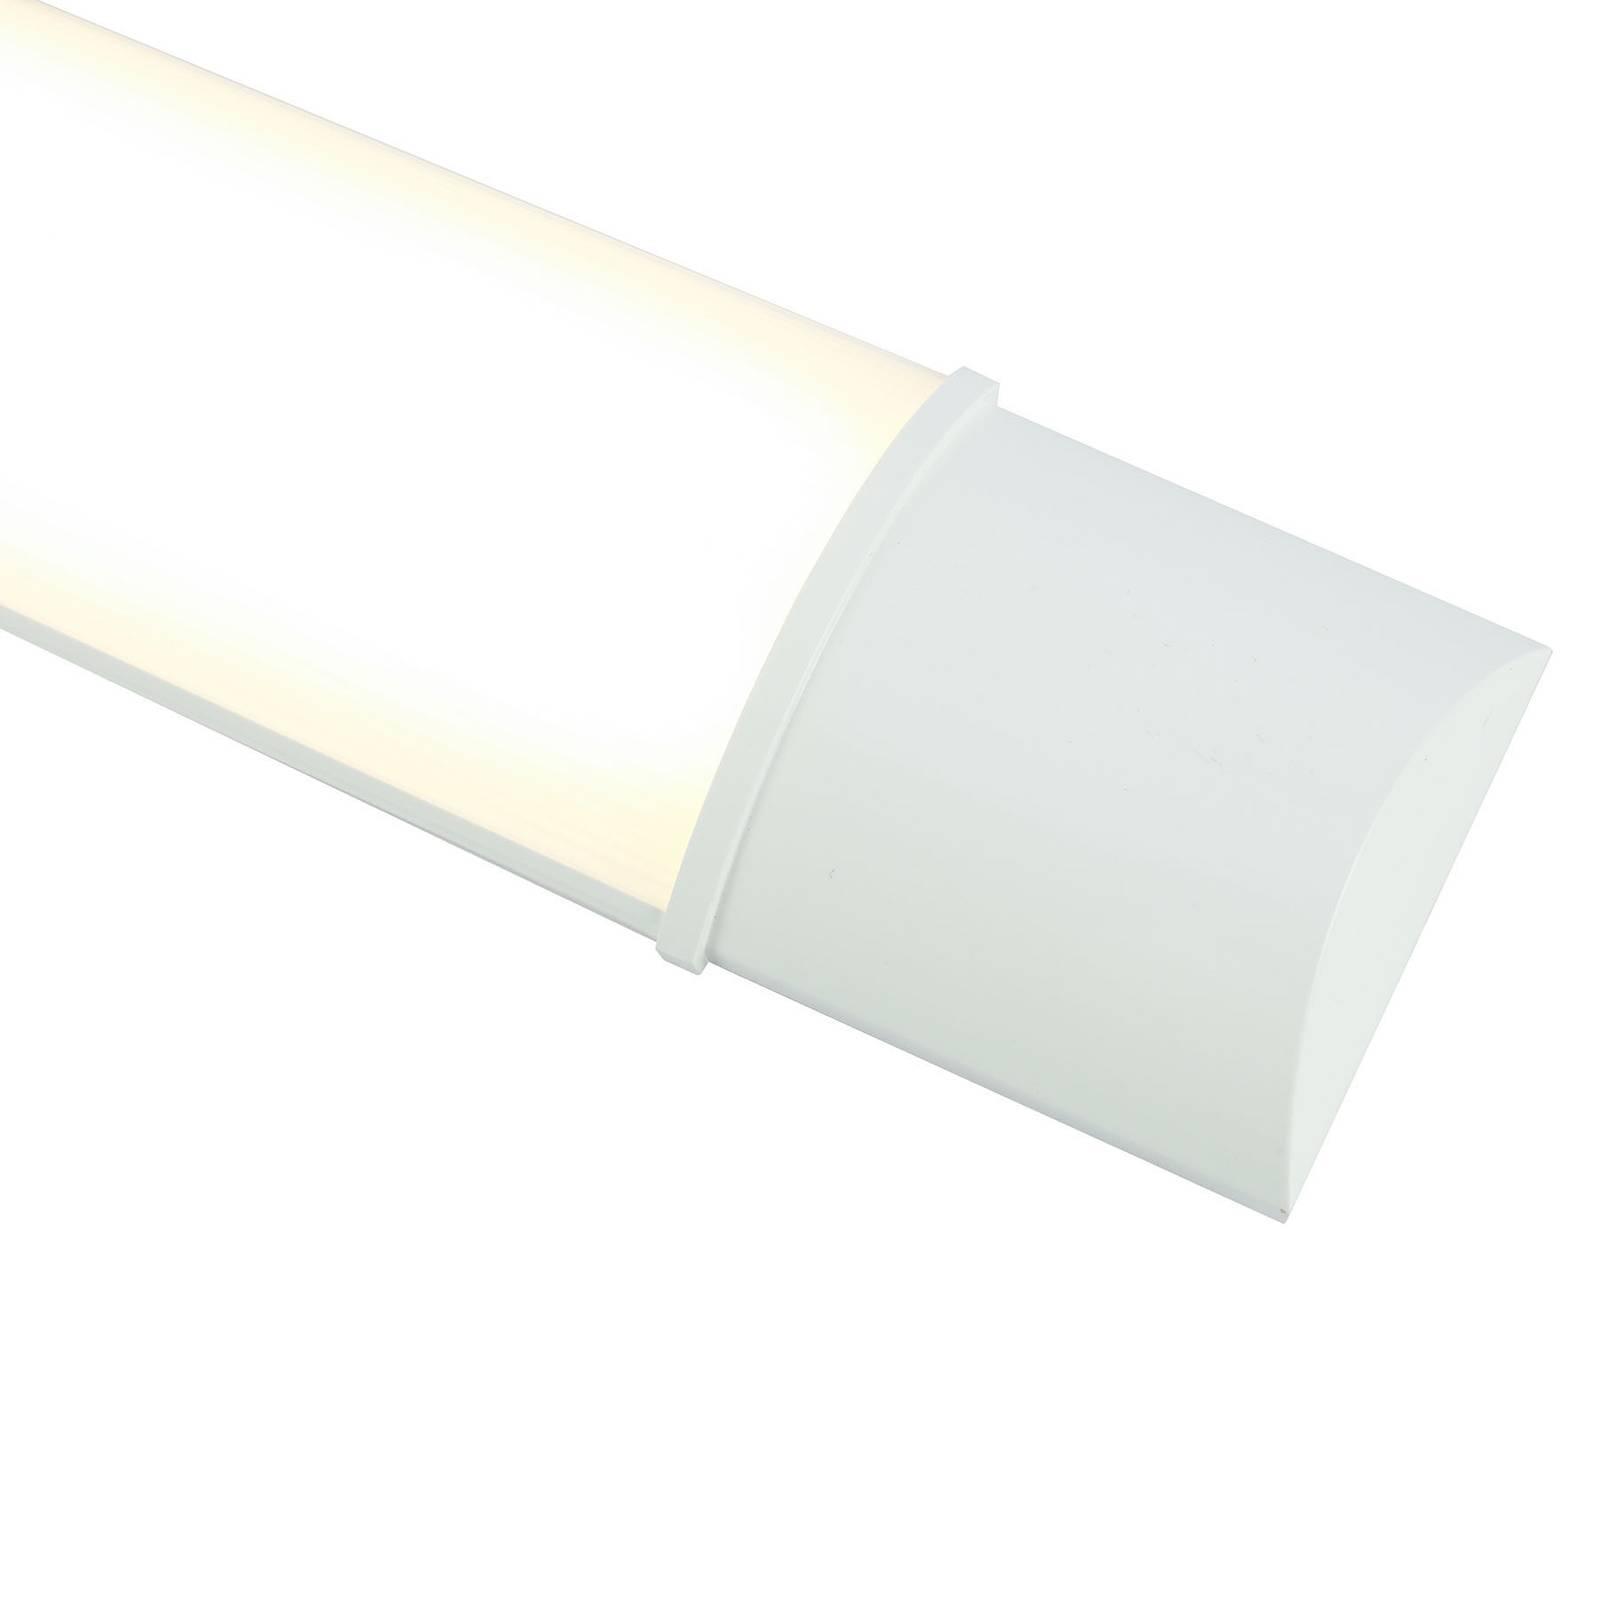 LED-kaapinalusvalaisin Obara, IP20, pituus 90 cm